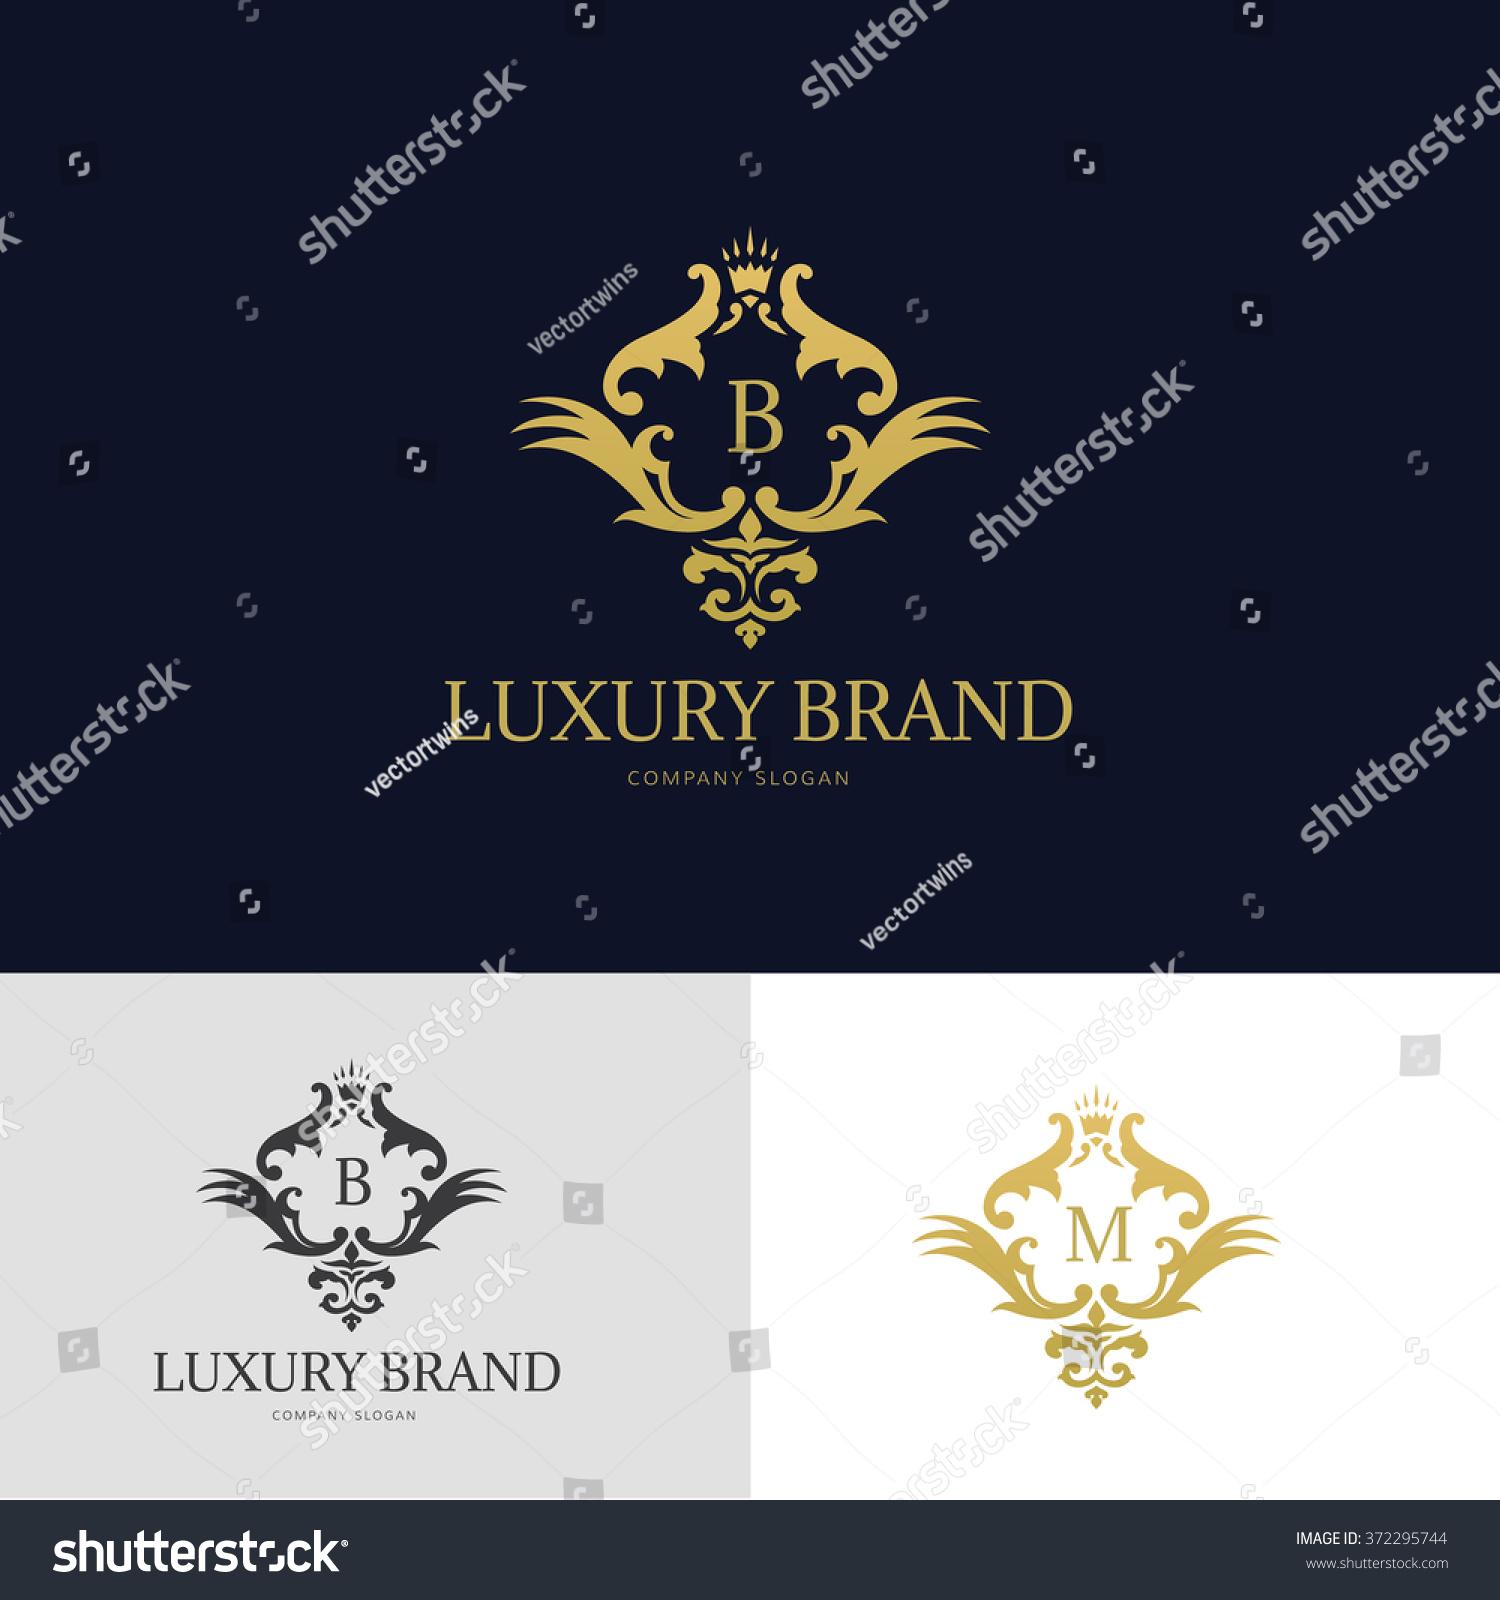 Royaltyfree Luxury Brand Logo designcrest logo 372295744 Stock